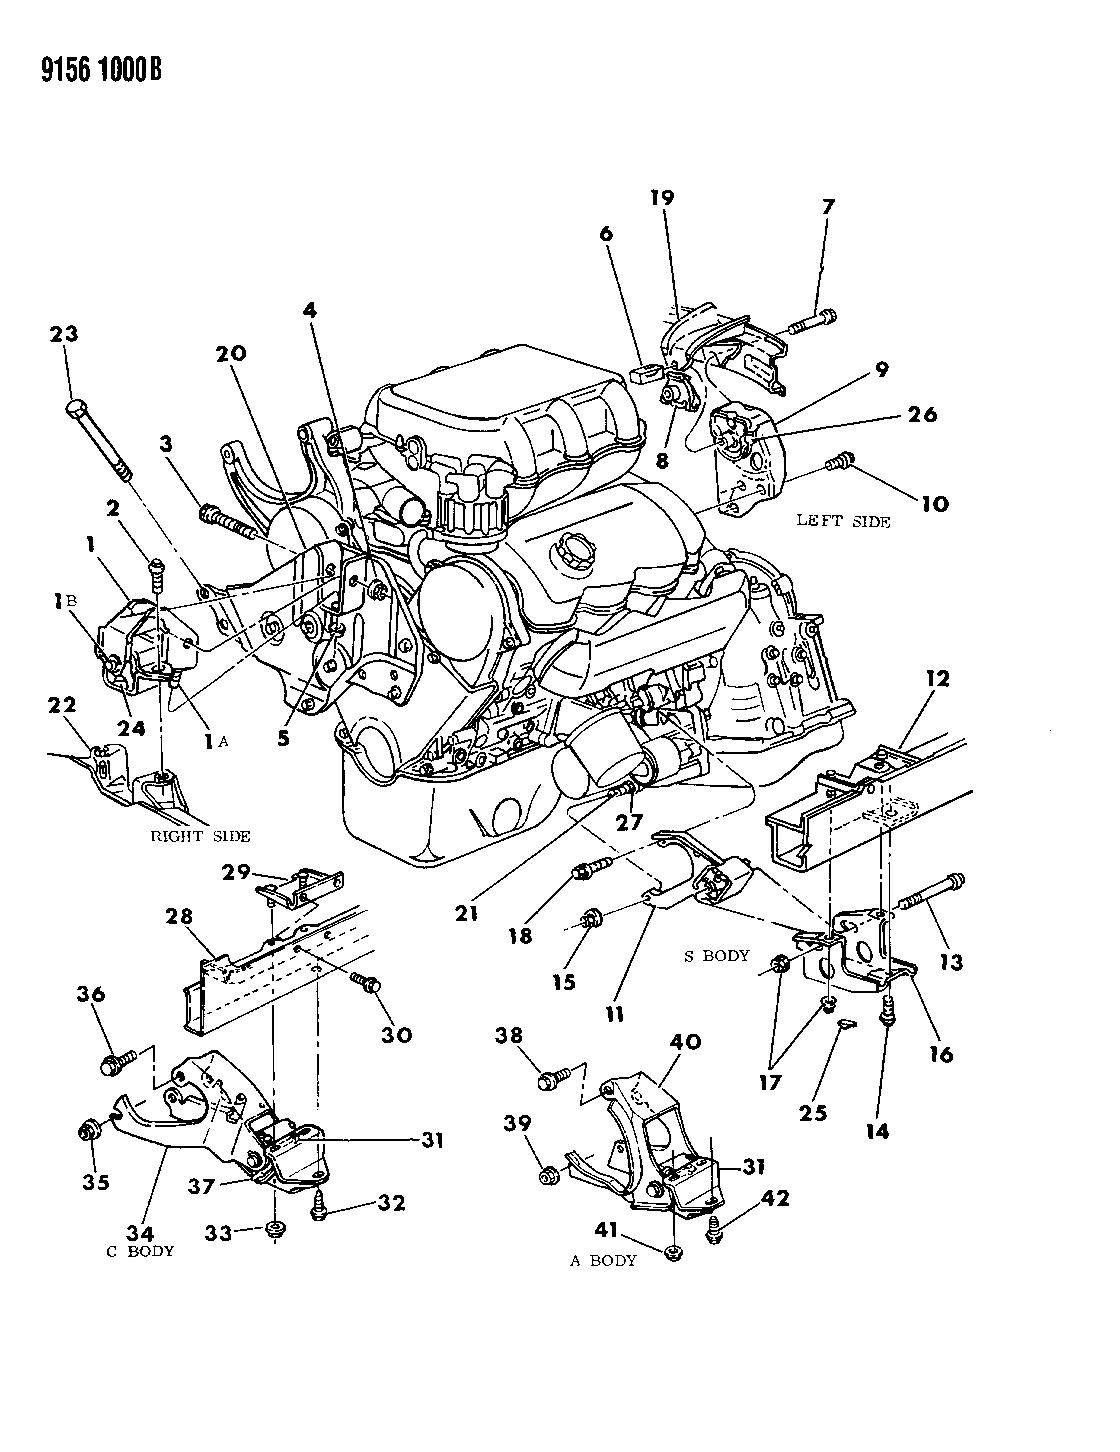 1989 Dodge Grand Caravan Engine Mounting - Thumbnail 1